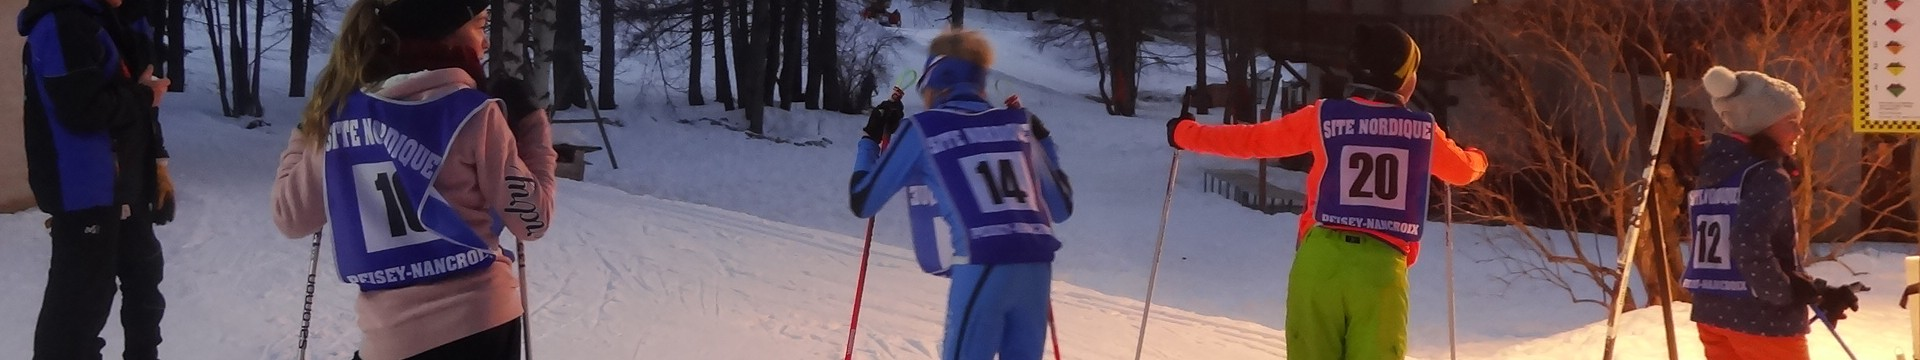 ski-and-run-01-9006